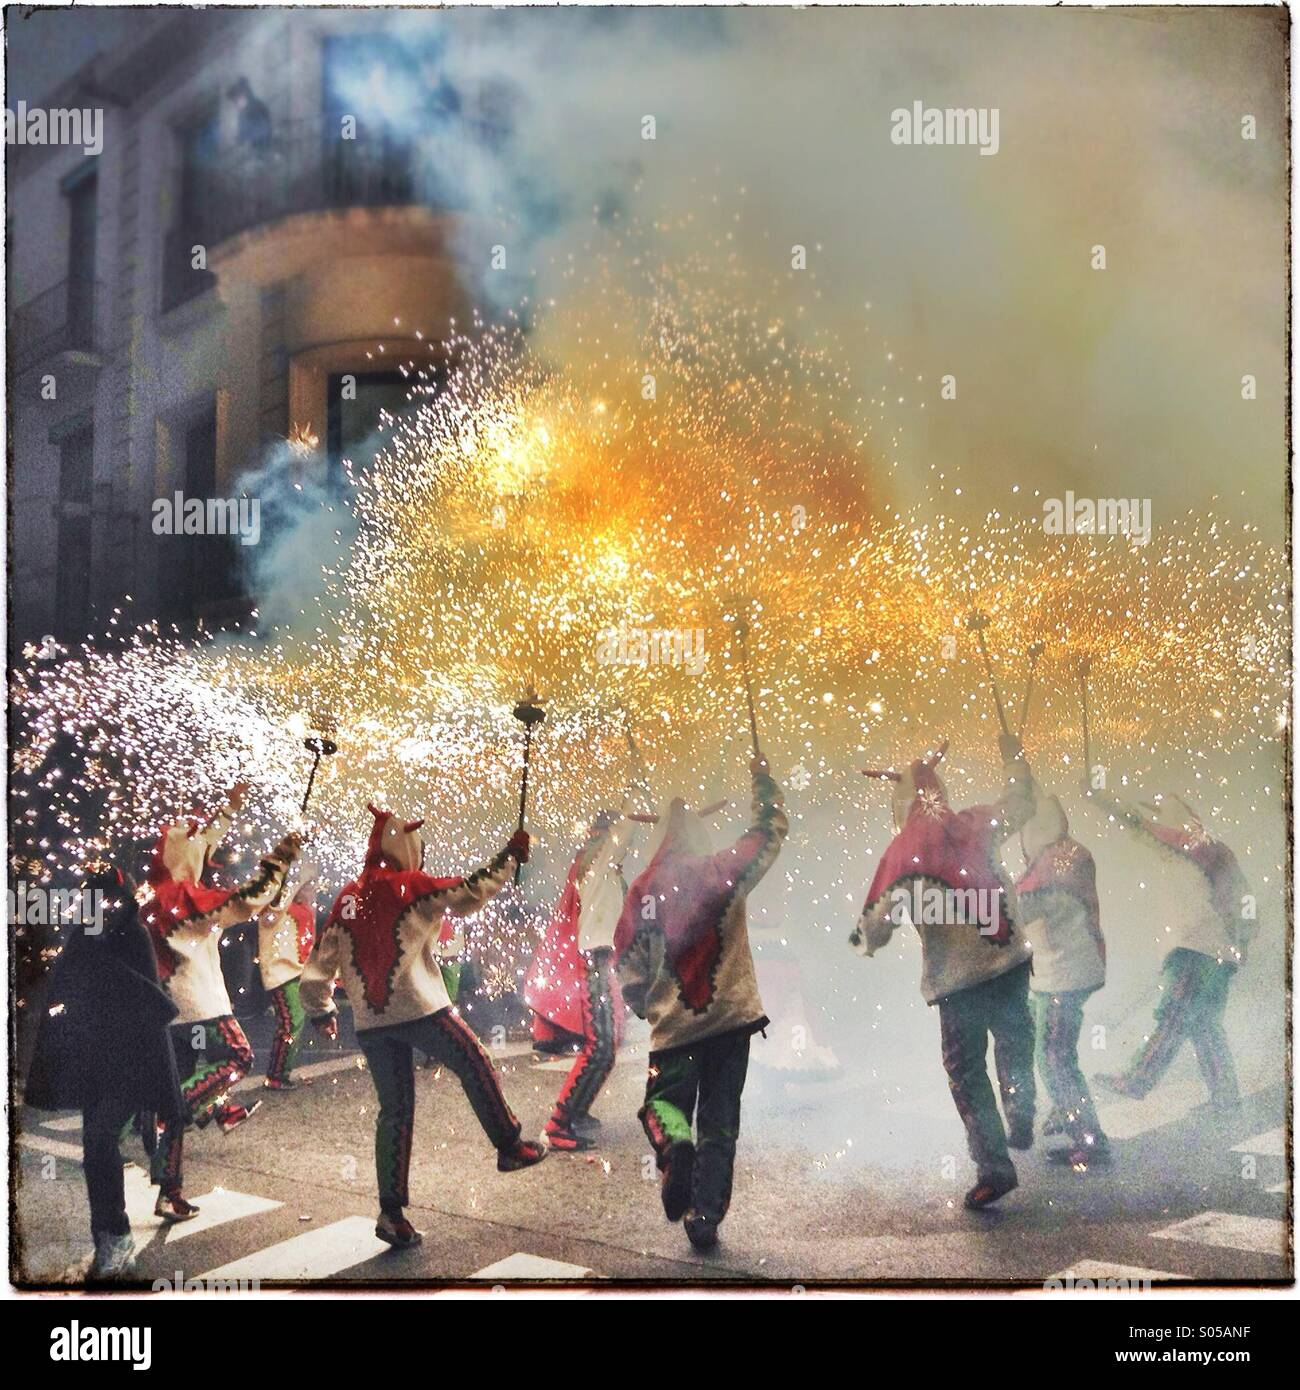 Correfoc, Feuerwerk, Les Santes, Mataró Stadtfest, Juli, Barcelona, Spanien. Feuer-Spiele in Katalonien Stockfoto